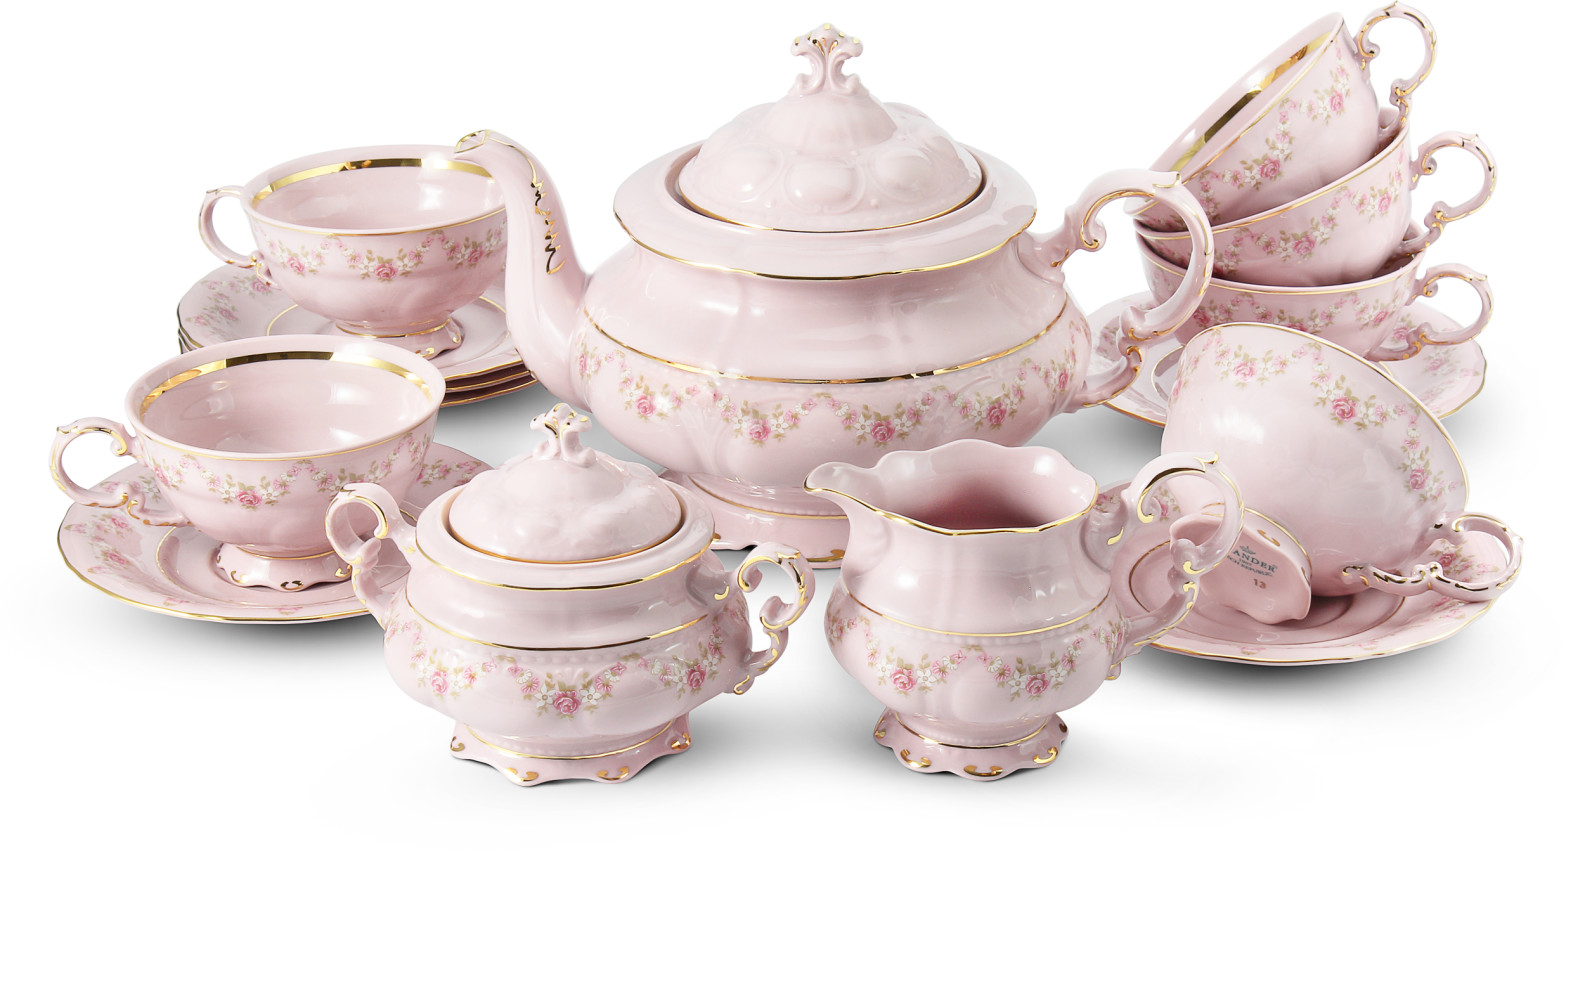 Teeservice 15-teilig - Girlande aus Rosen rosa Porzellan